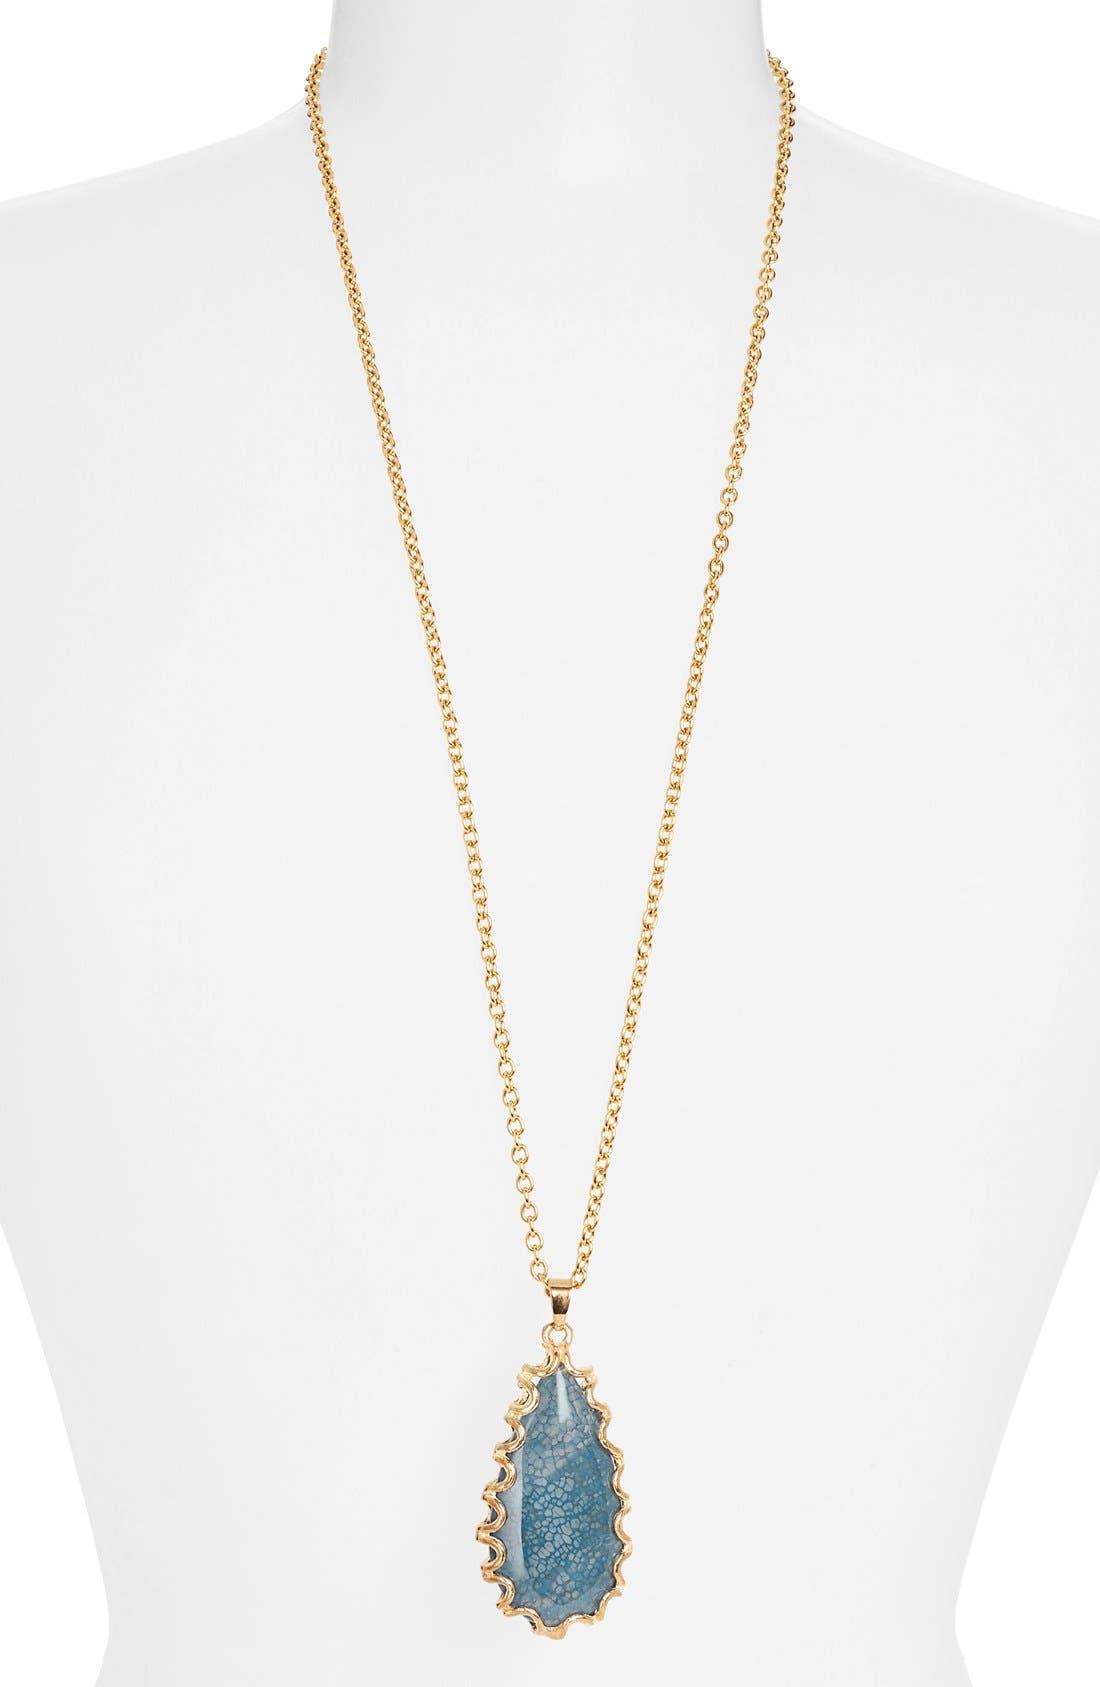 Main Image - Nordstrom 'Sorcerer's Stone' Long Teardrop Pendant Necklace